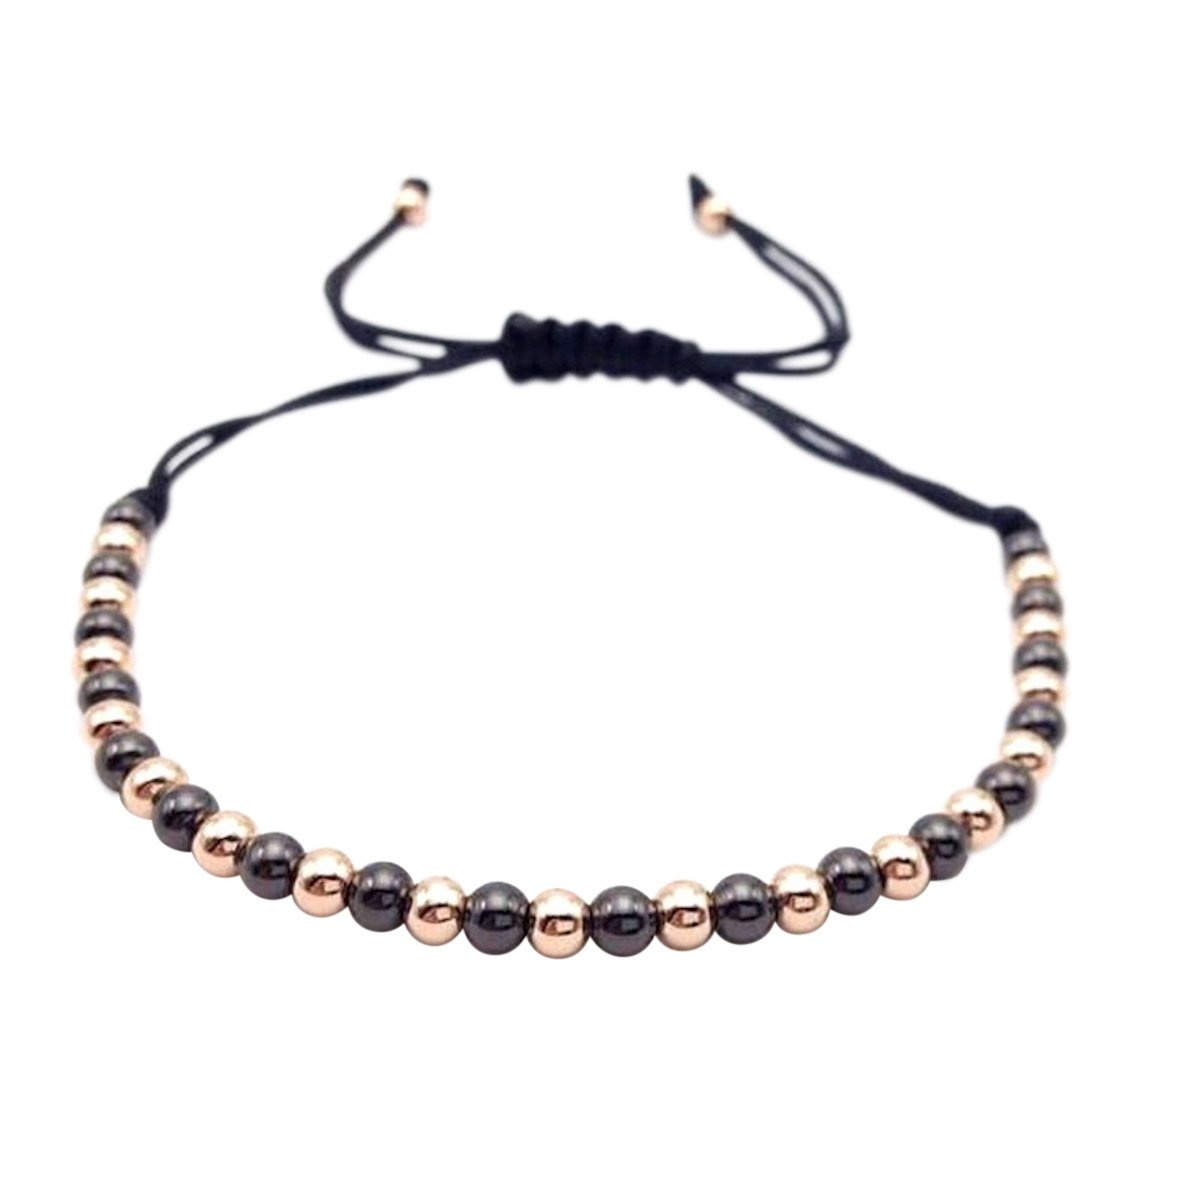 Macrame Braided 4mm Round Copper Beads Bracelet by MayaBracelets (Gun Black & Rose Gold)